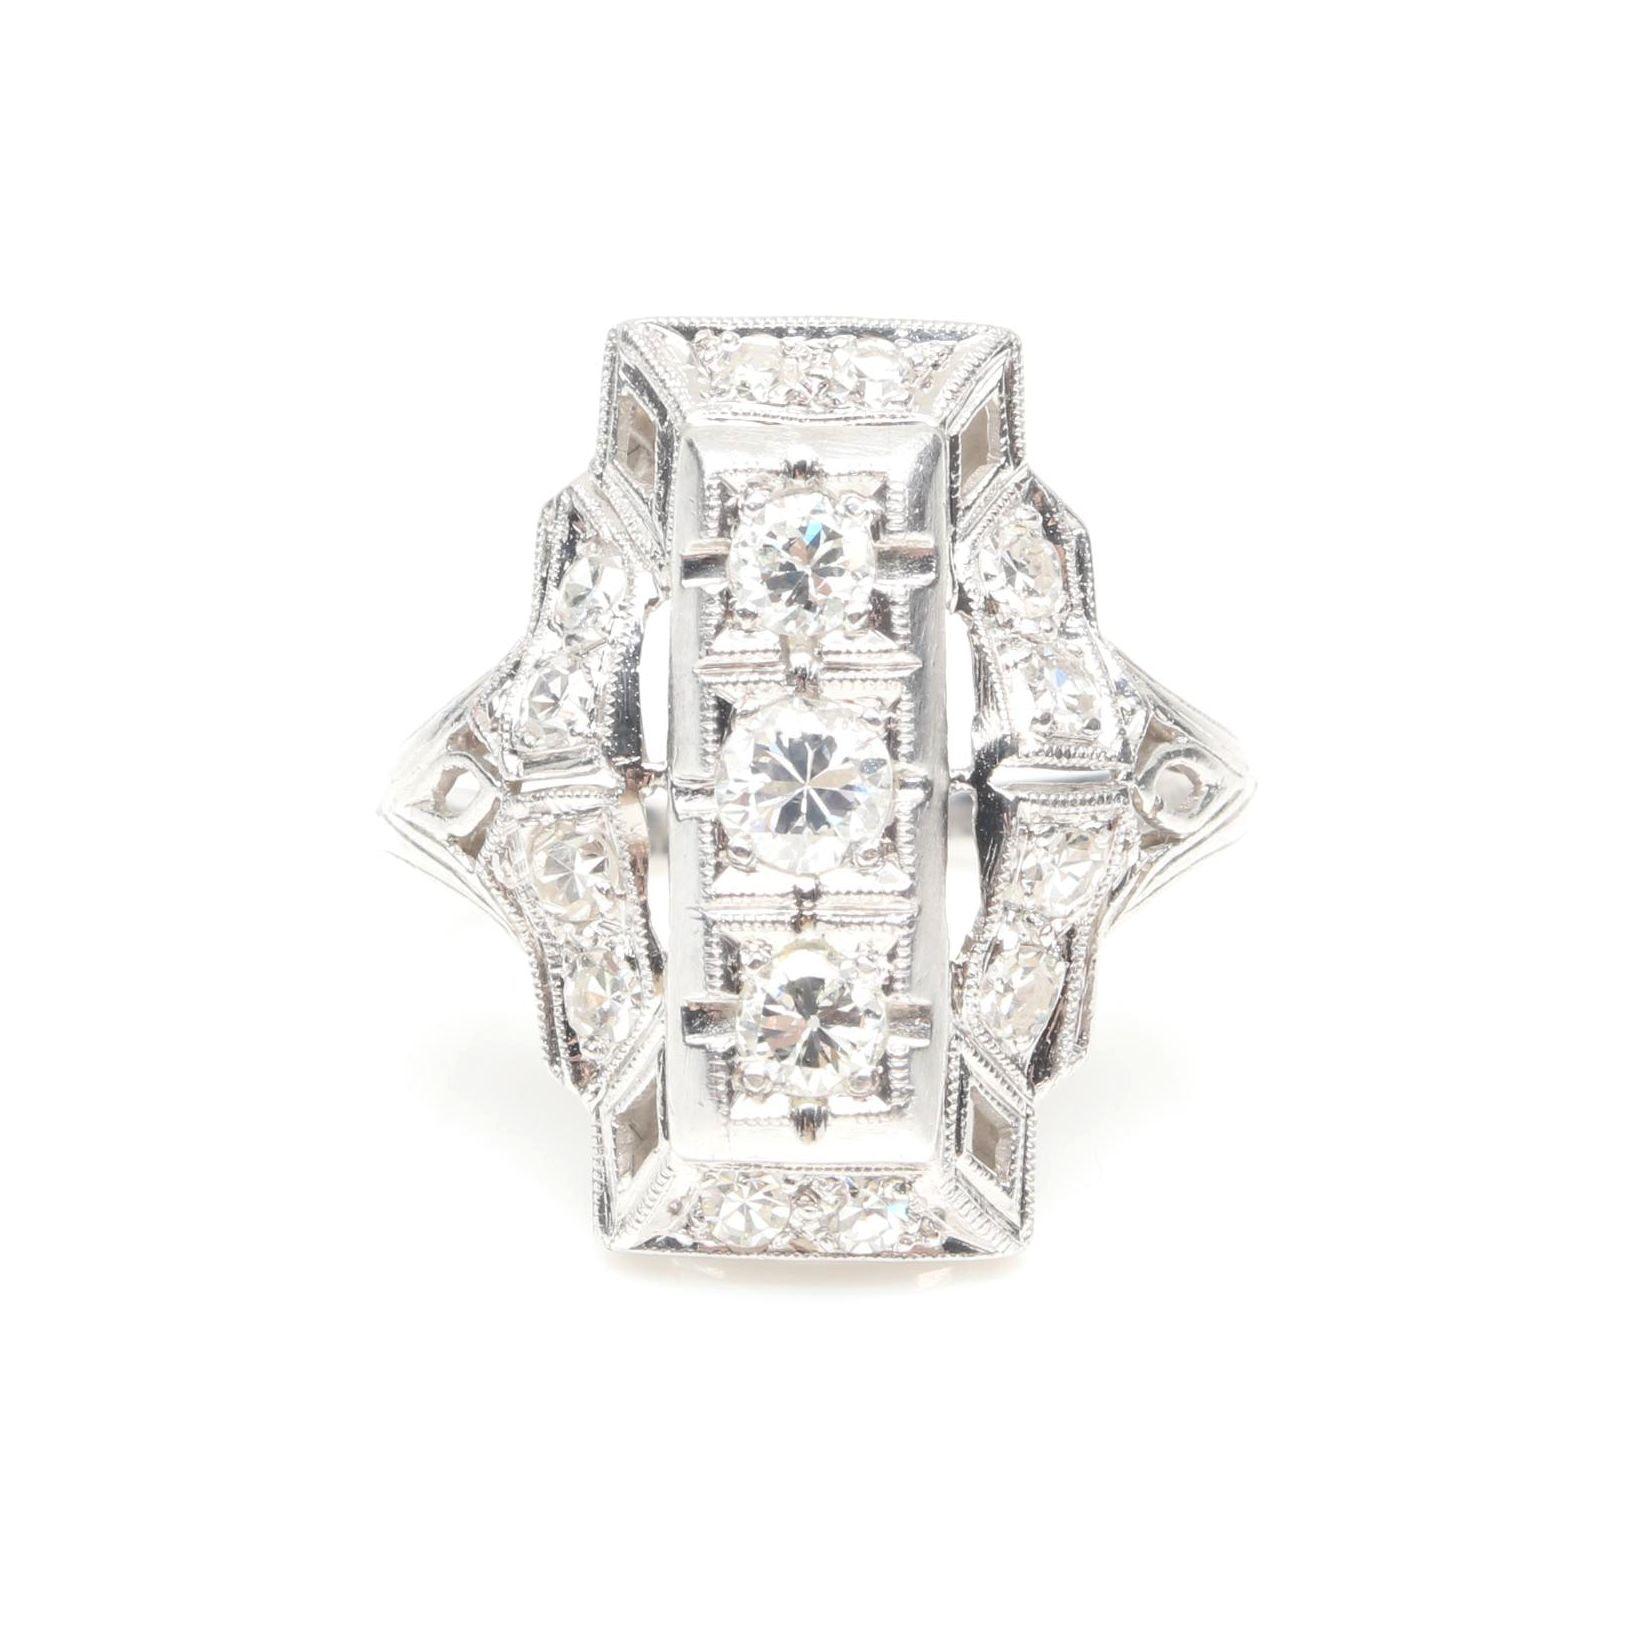 Transitional Art Deco Platinum and Diamond Dinner Ring